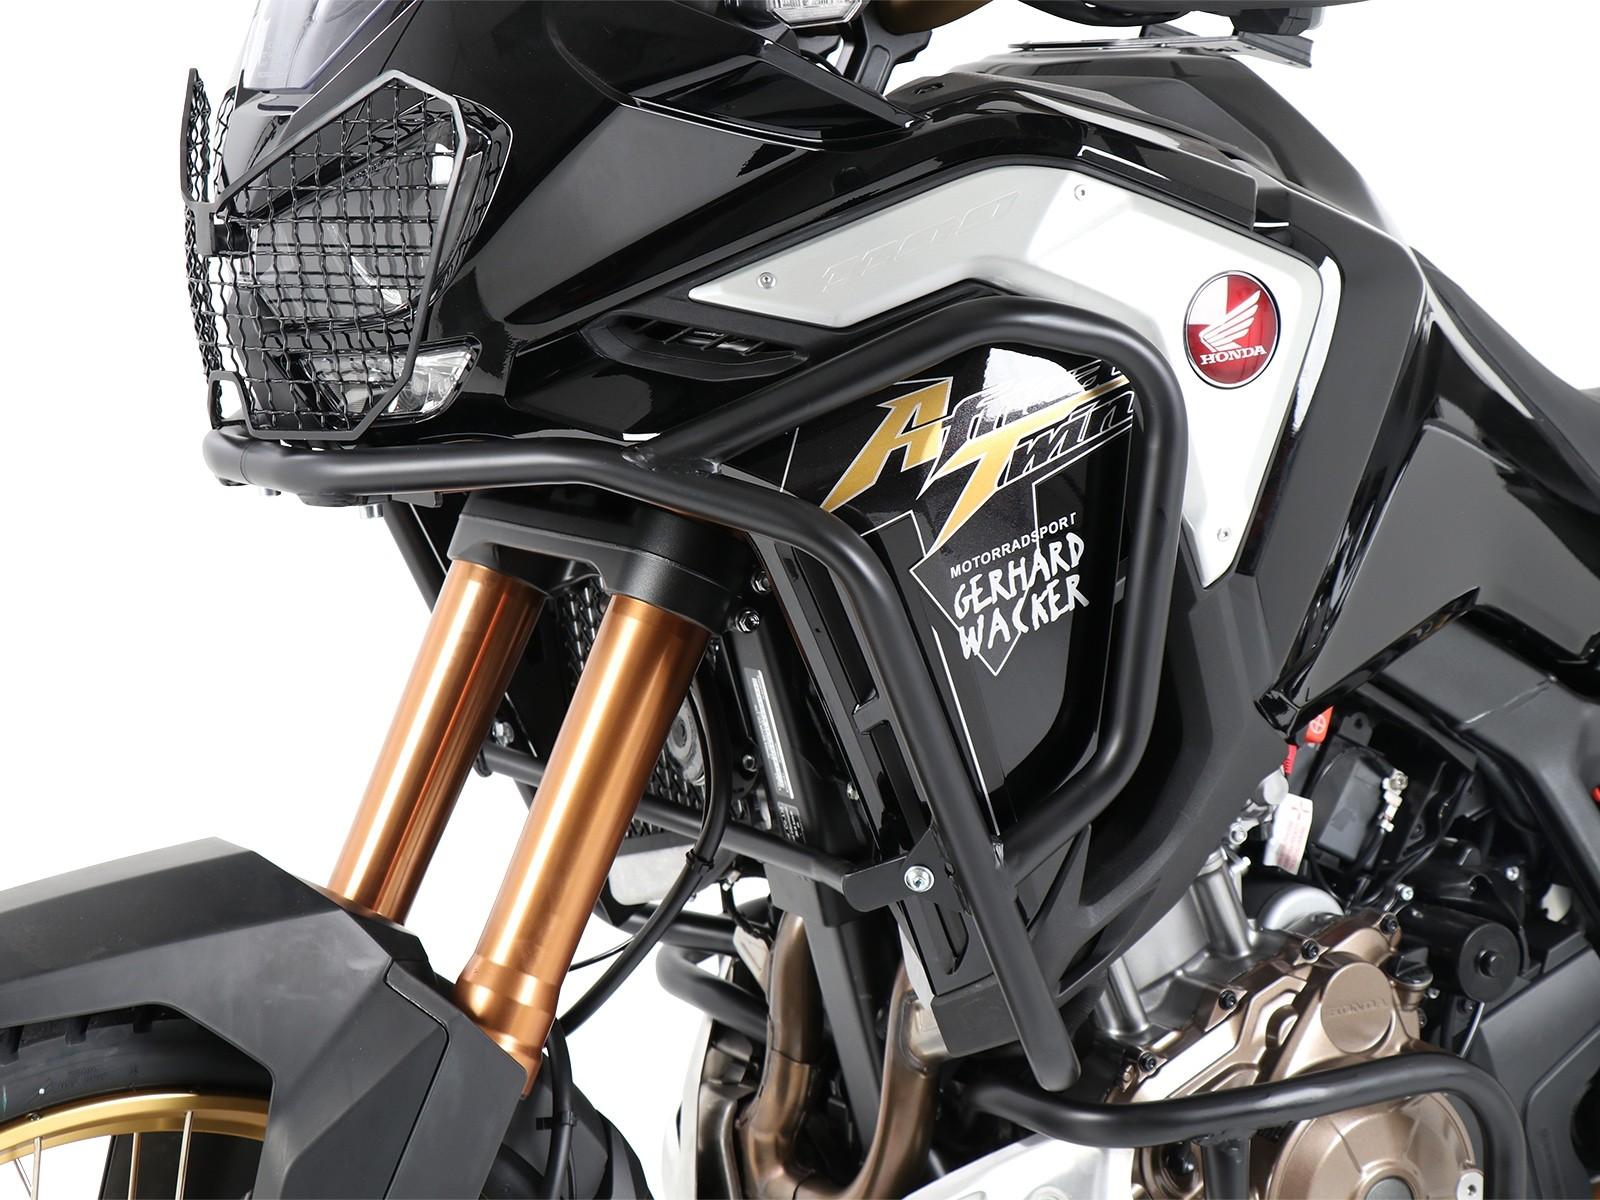 Hepco Upper Engine/Tank Protection Honda CRF 1100 L Africa Twin Adventure Sports- Black 2020